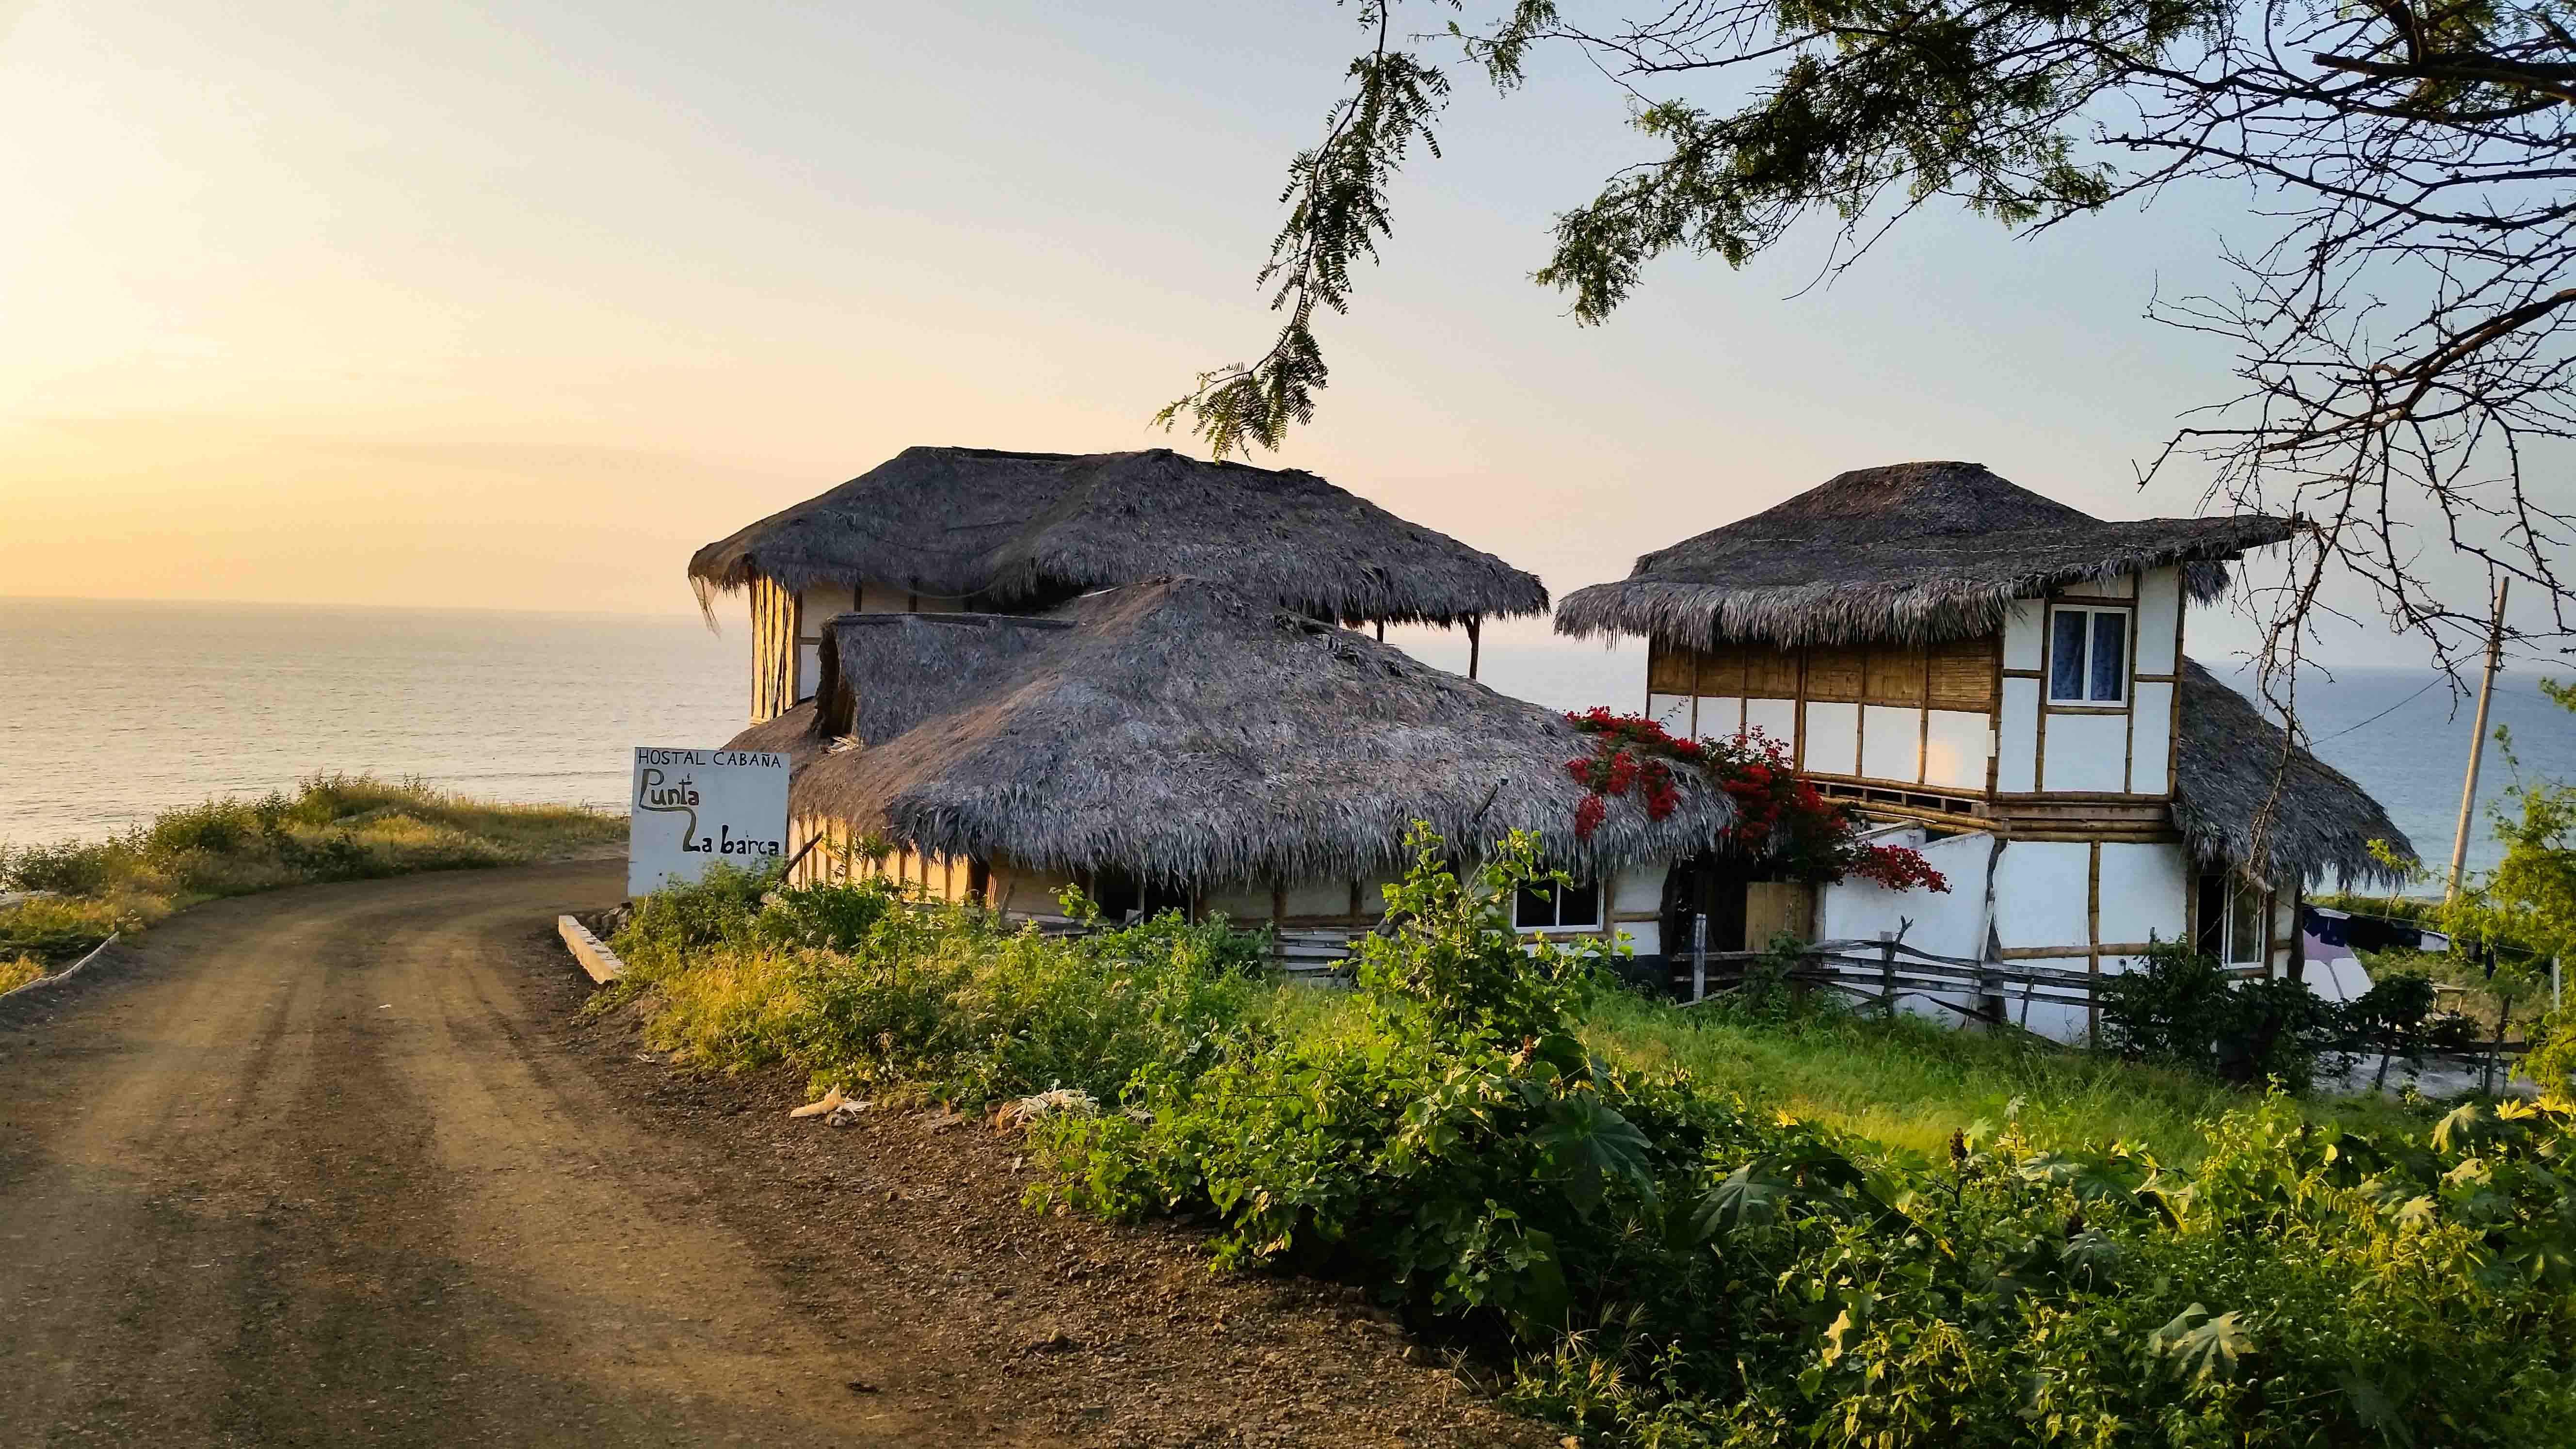 13 Residents | Santa Marianita | Beachfront Bamboo Villa - Incl. Coworking + Outdoors Areas